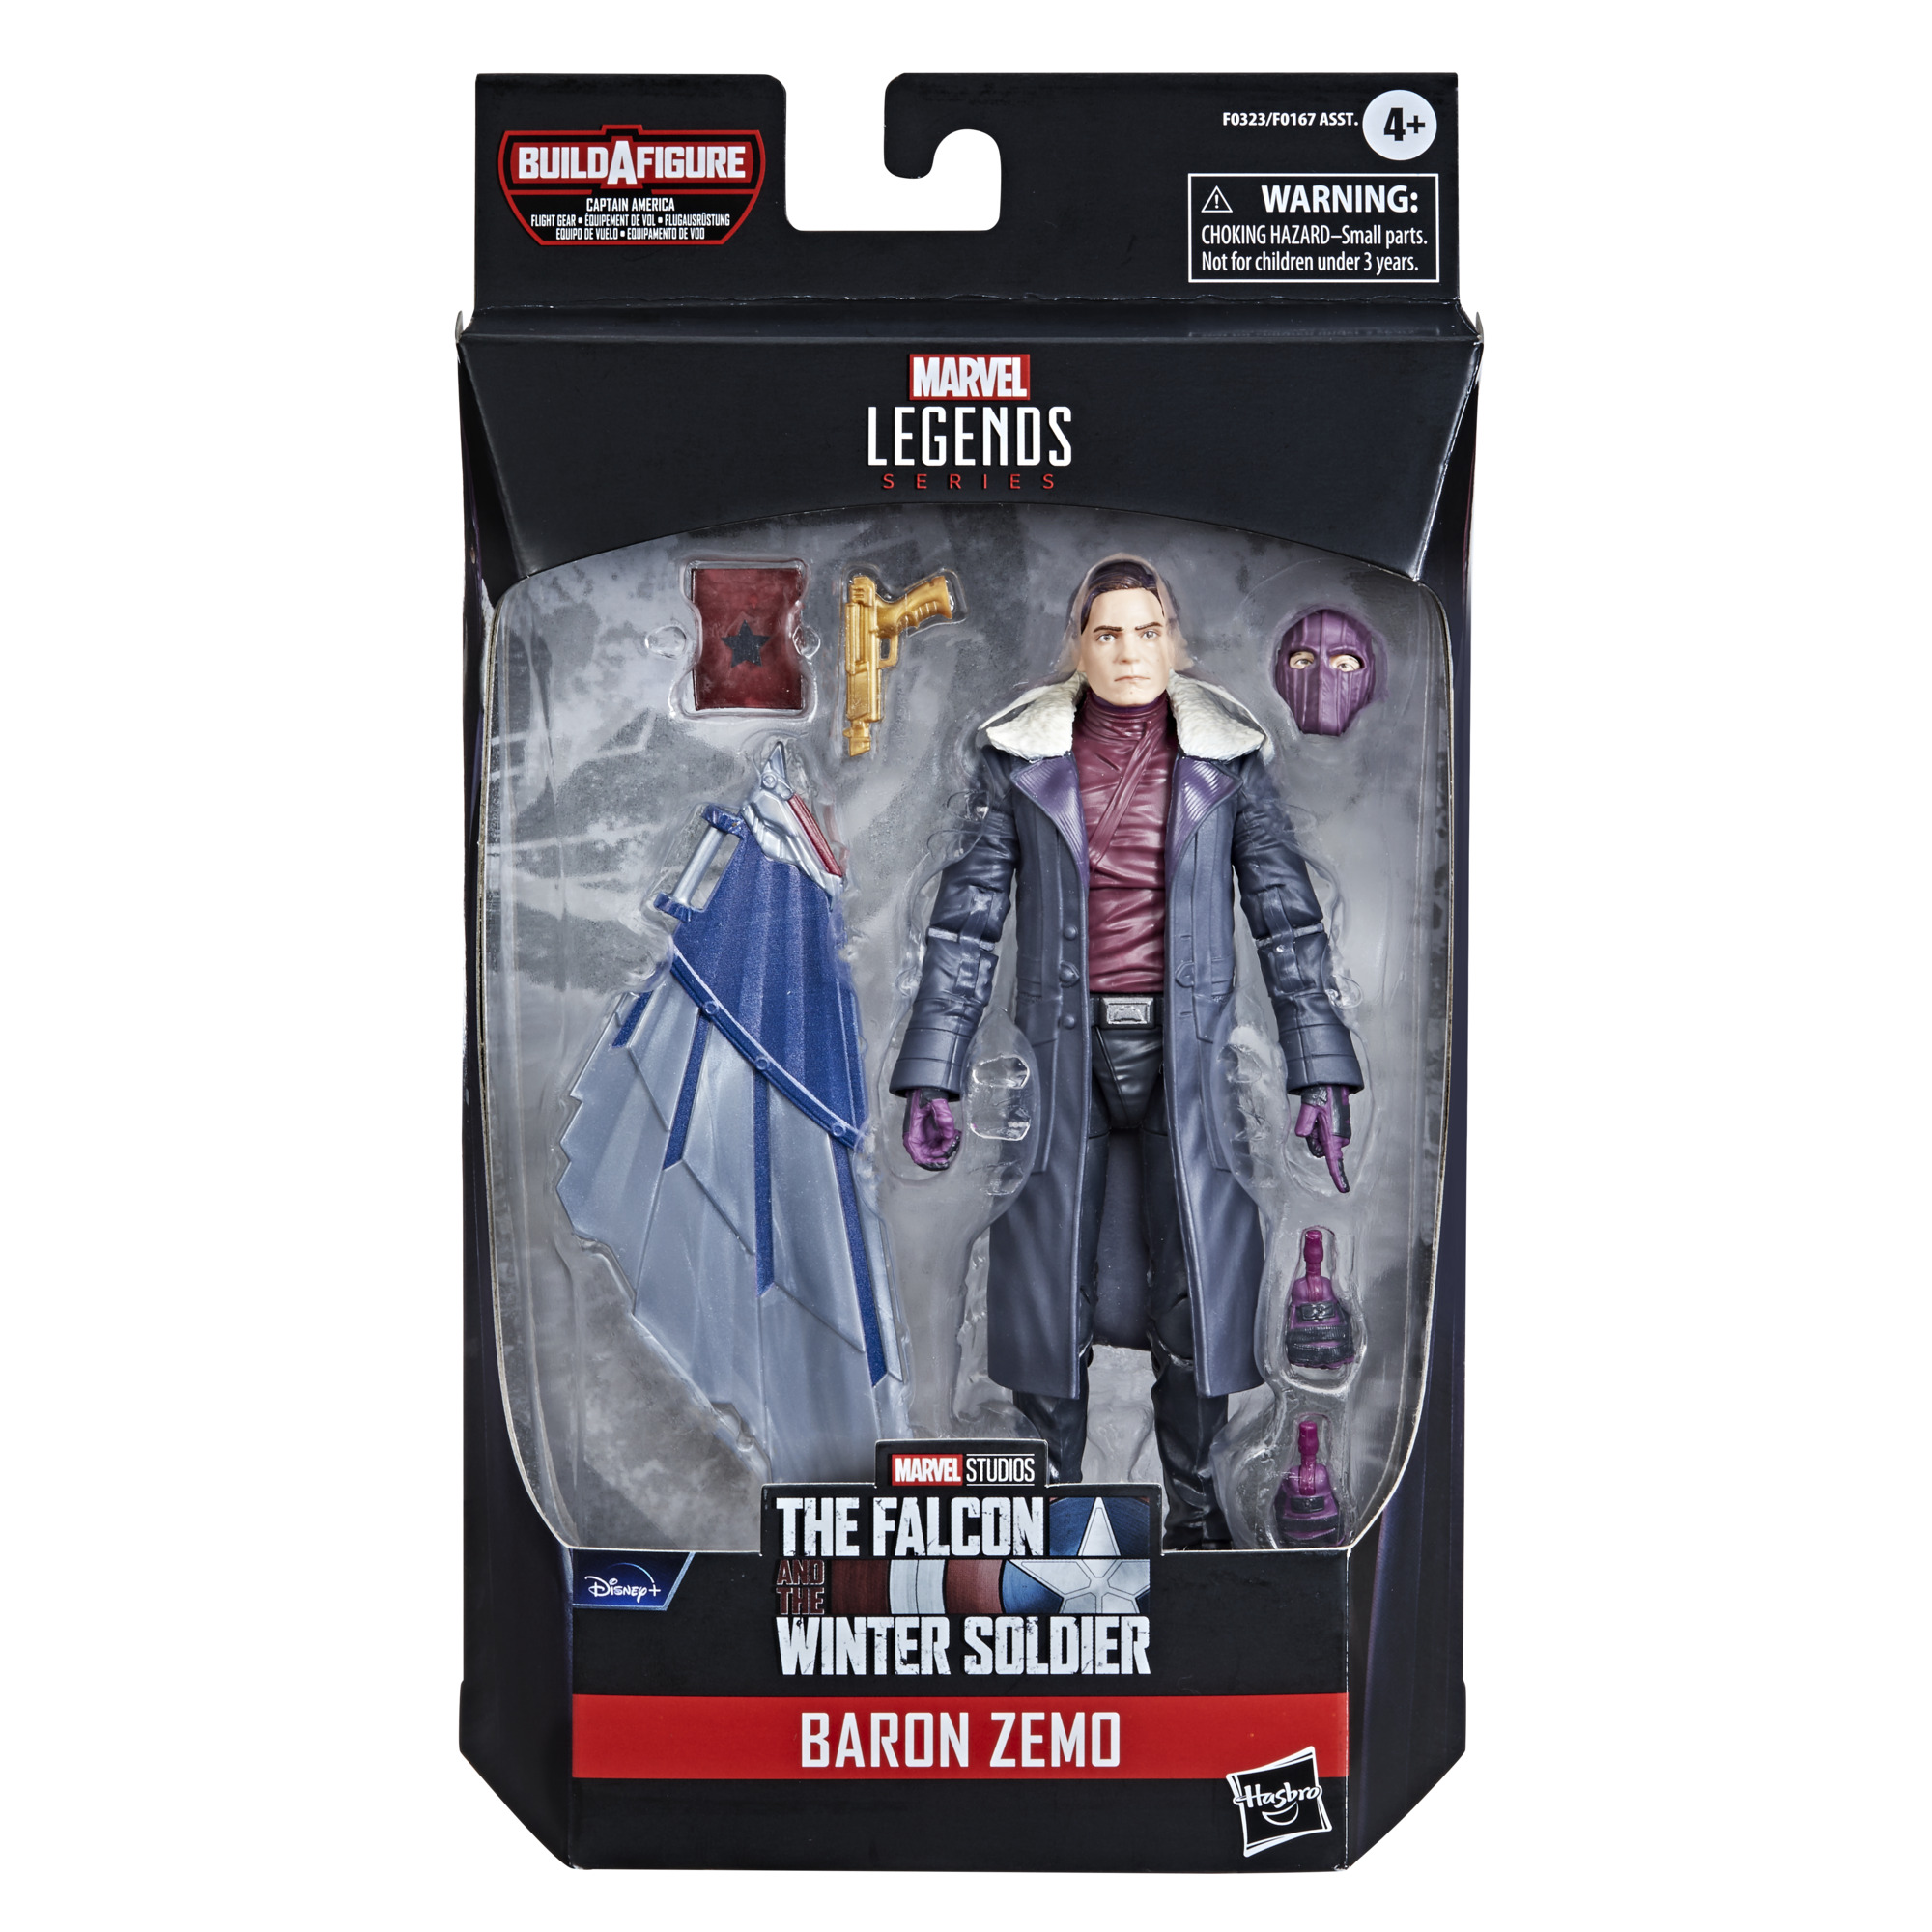 Marvel Legends Series Avengers Baron Zemo Build a Figure F0323 5010993791125